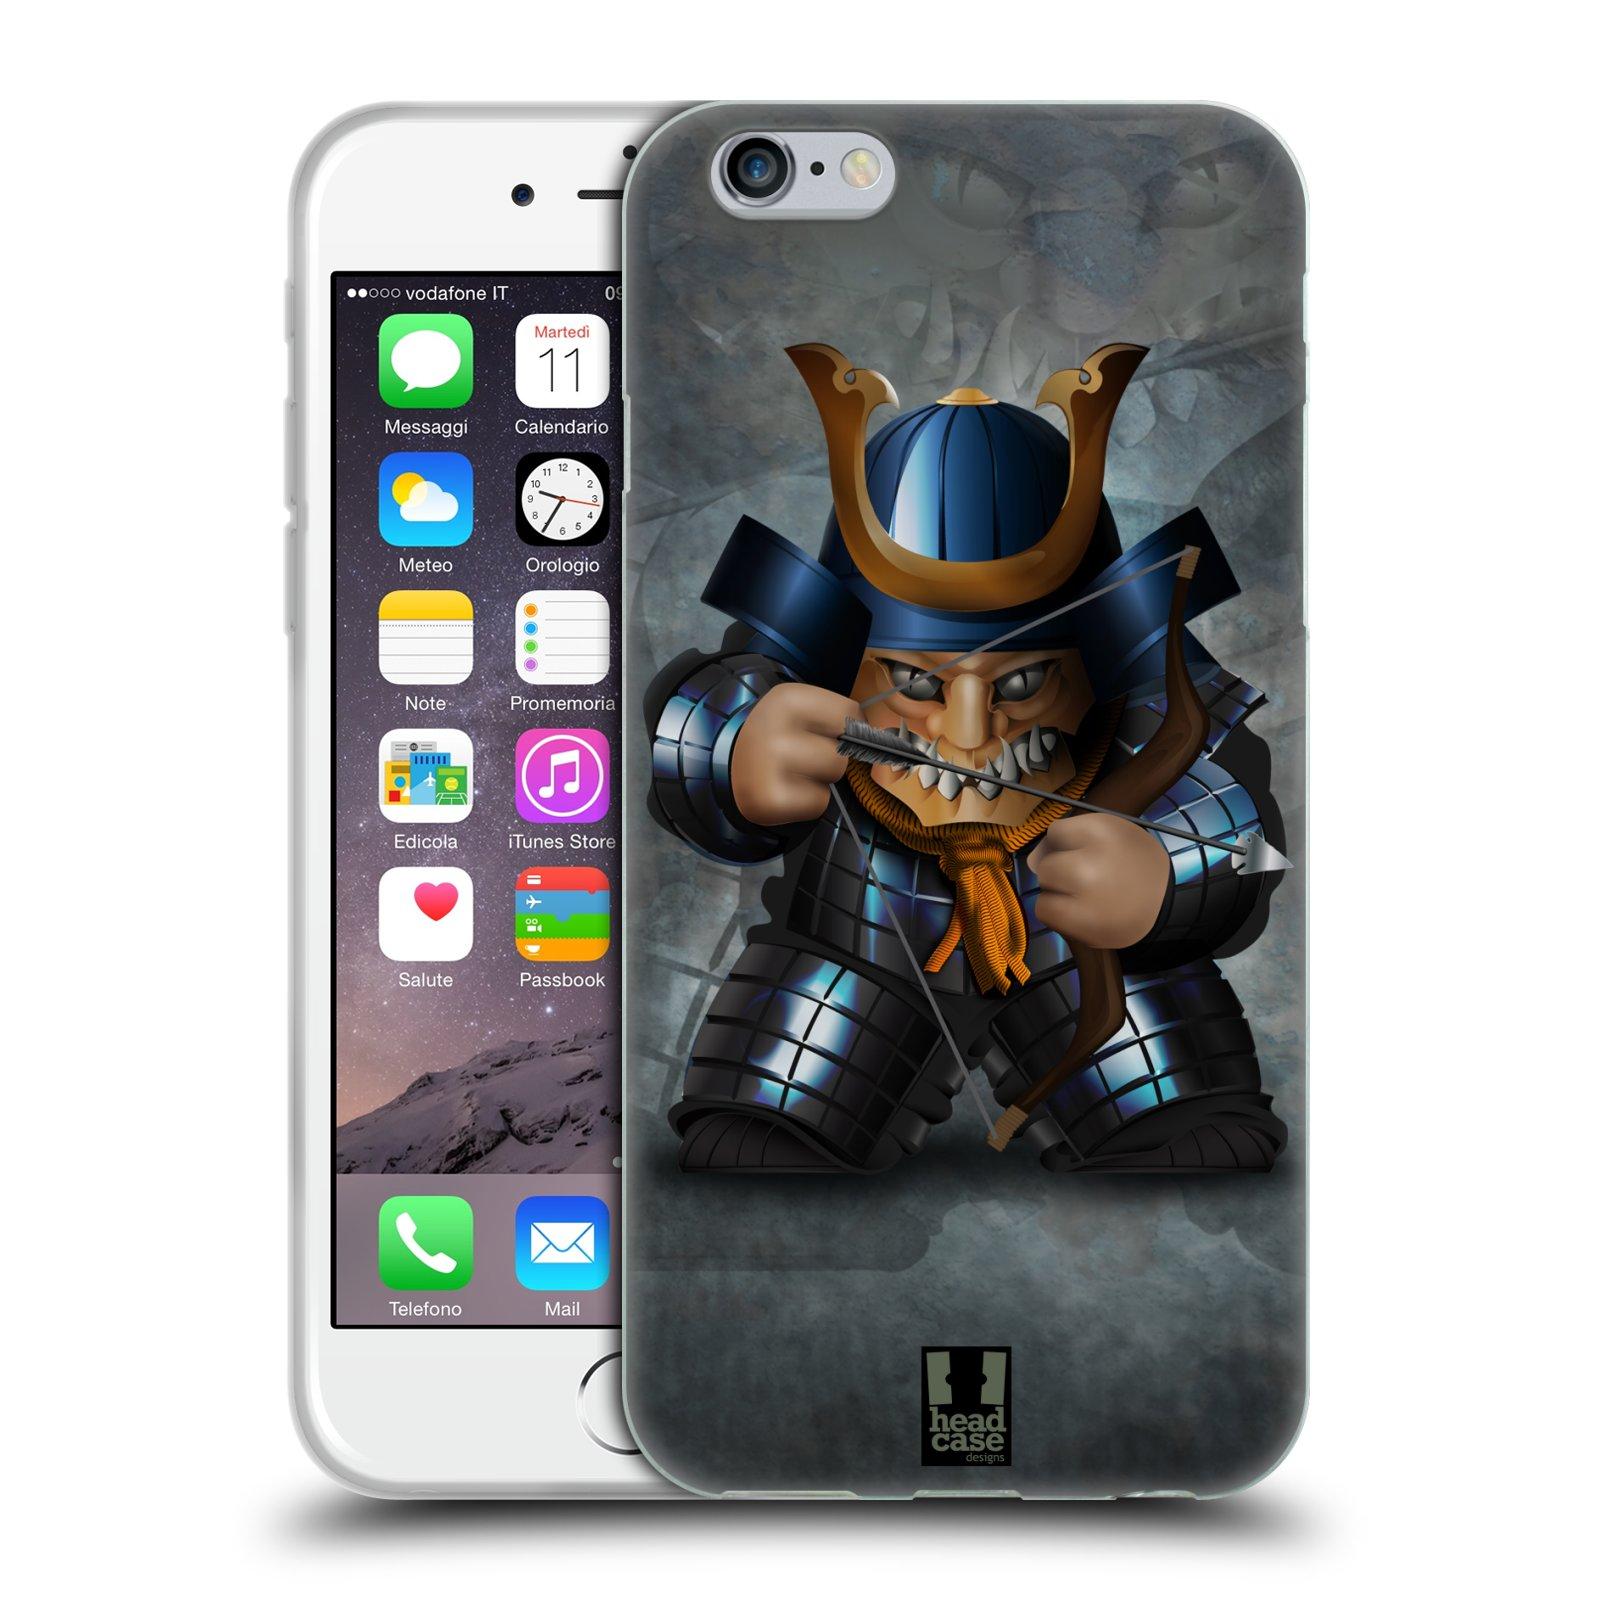 HEAD CASE silikonový obal na mobil Apple Iphone 6/6S vzor Malí bojovníci SHOGUN STŘELEC